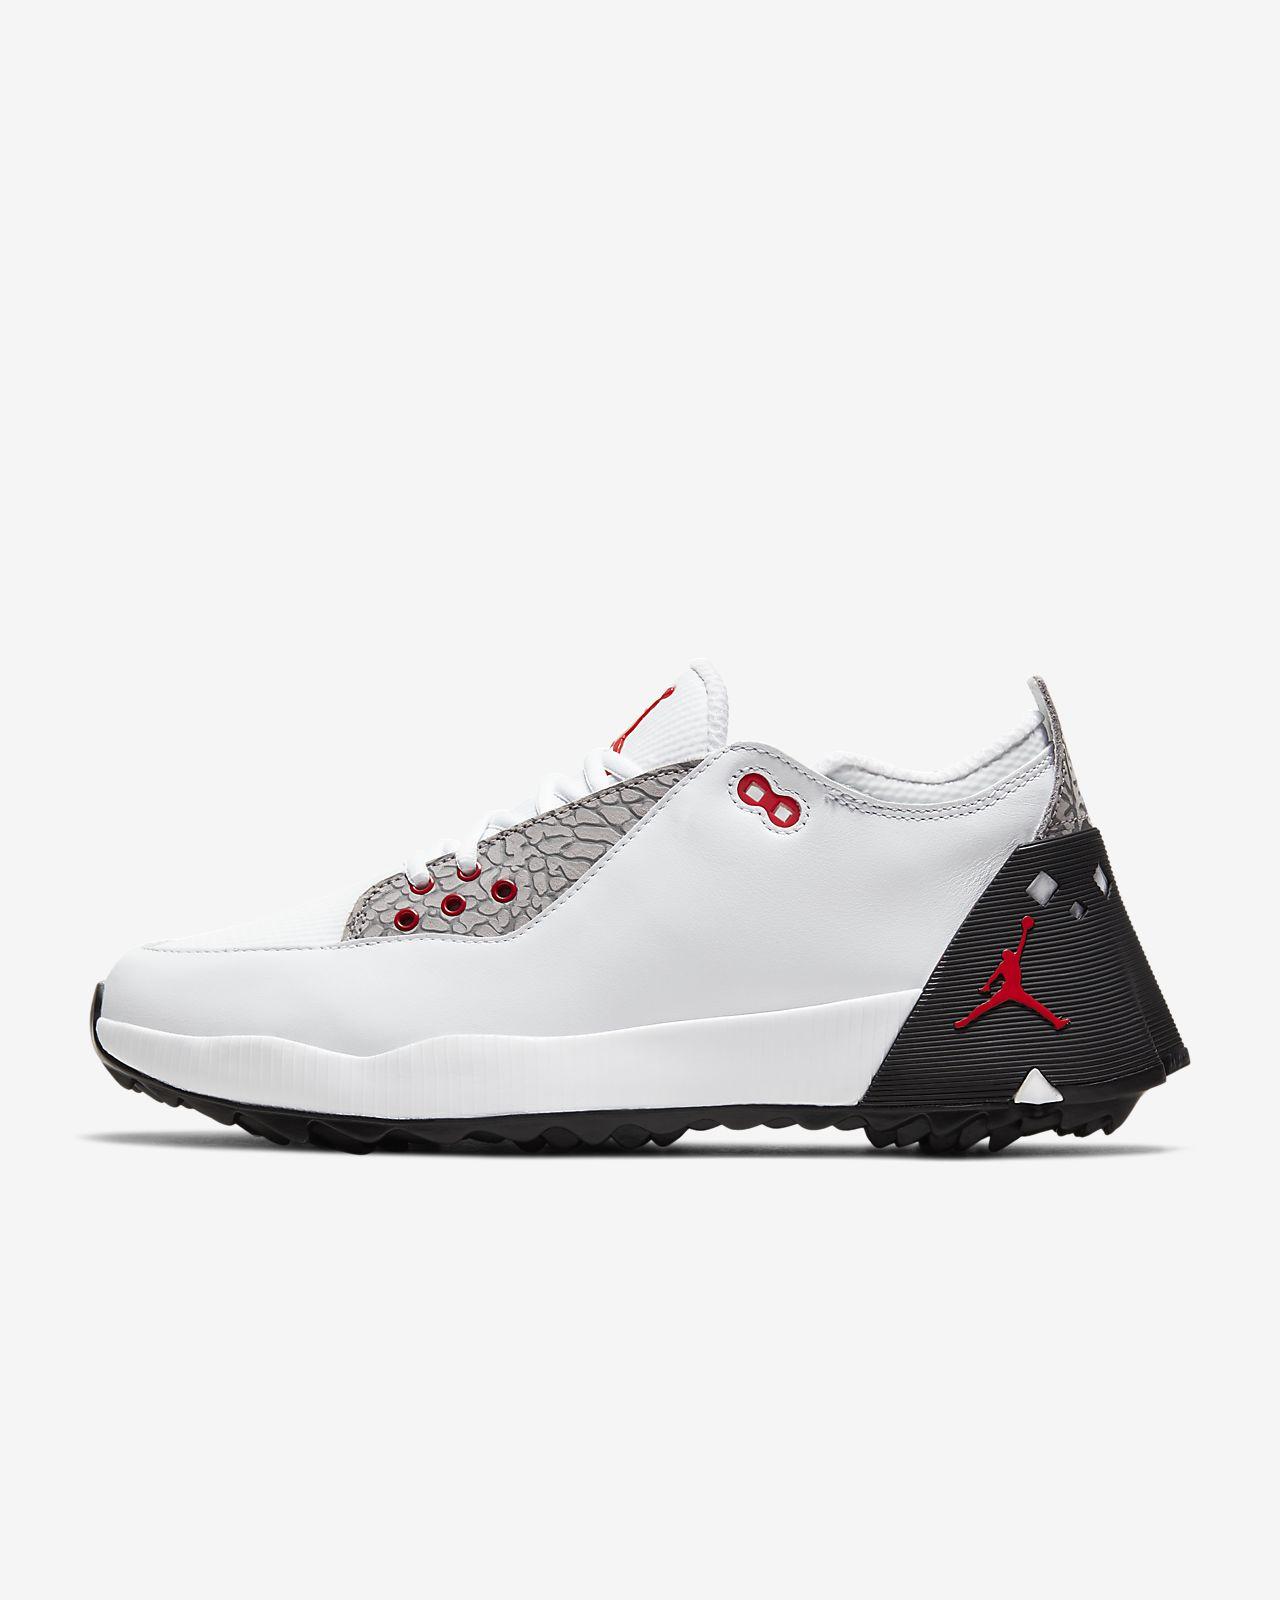 Jordan ADG Herren-Golfschuh